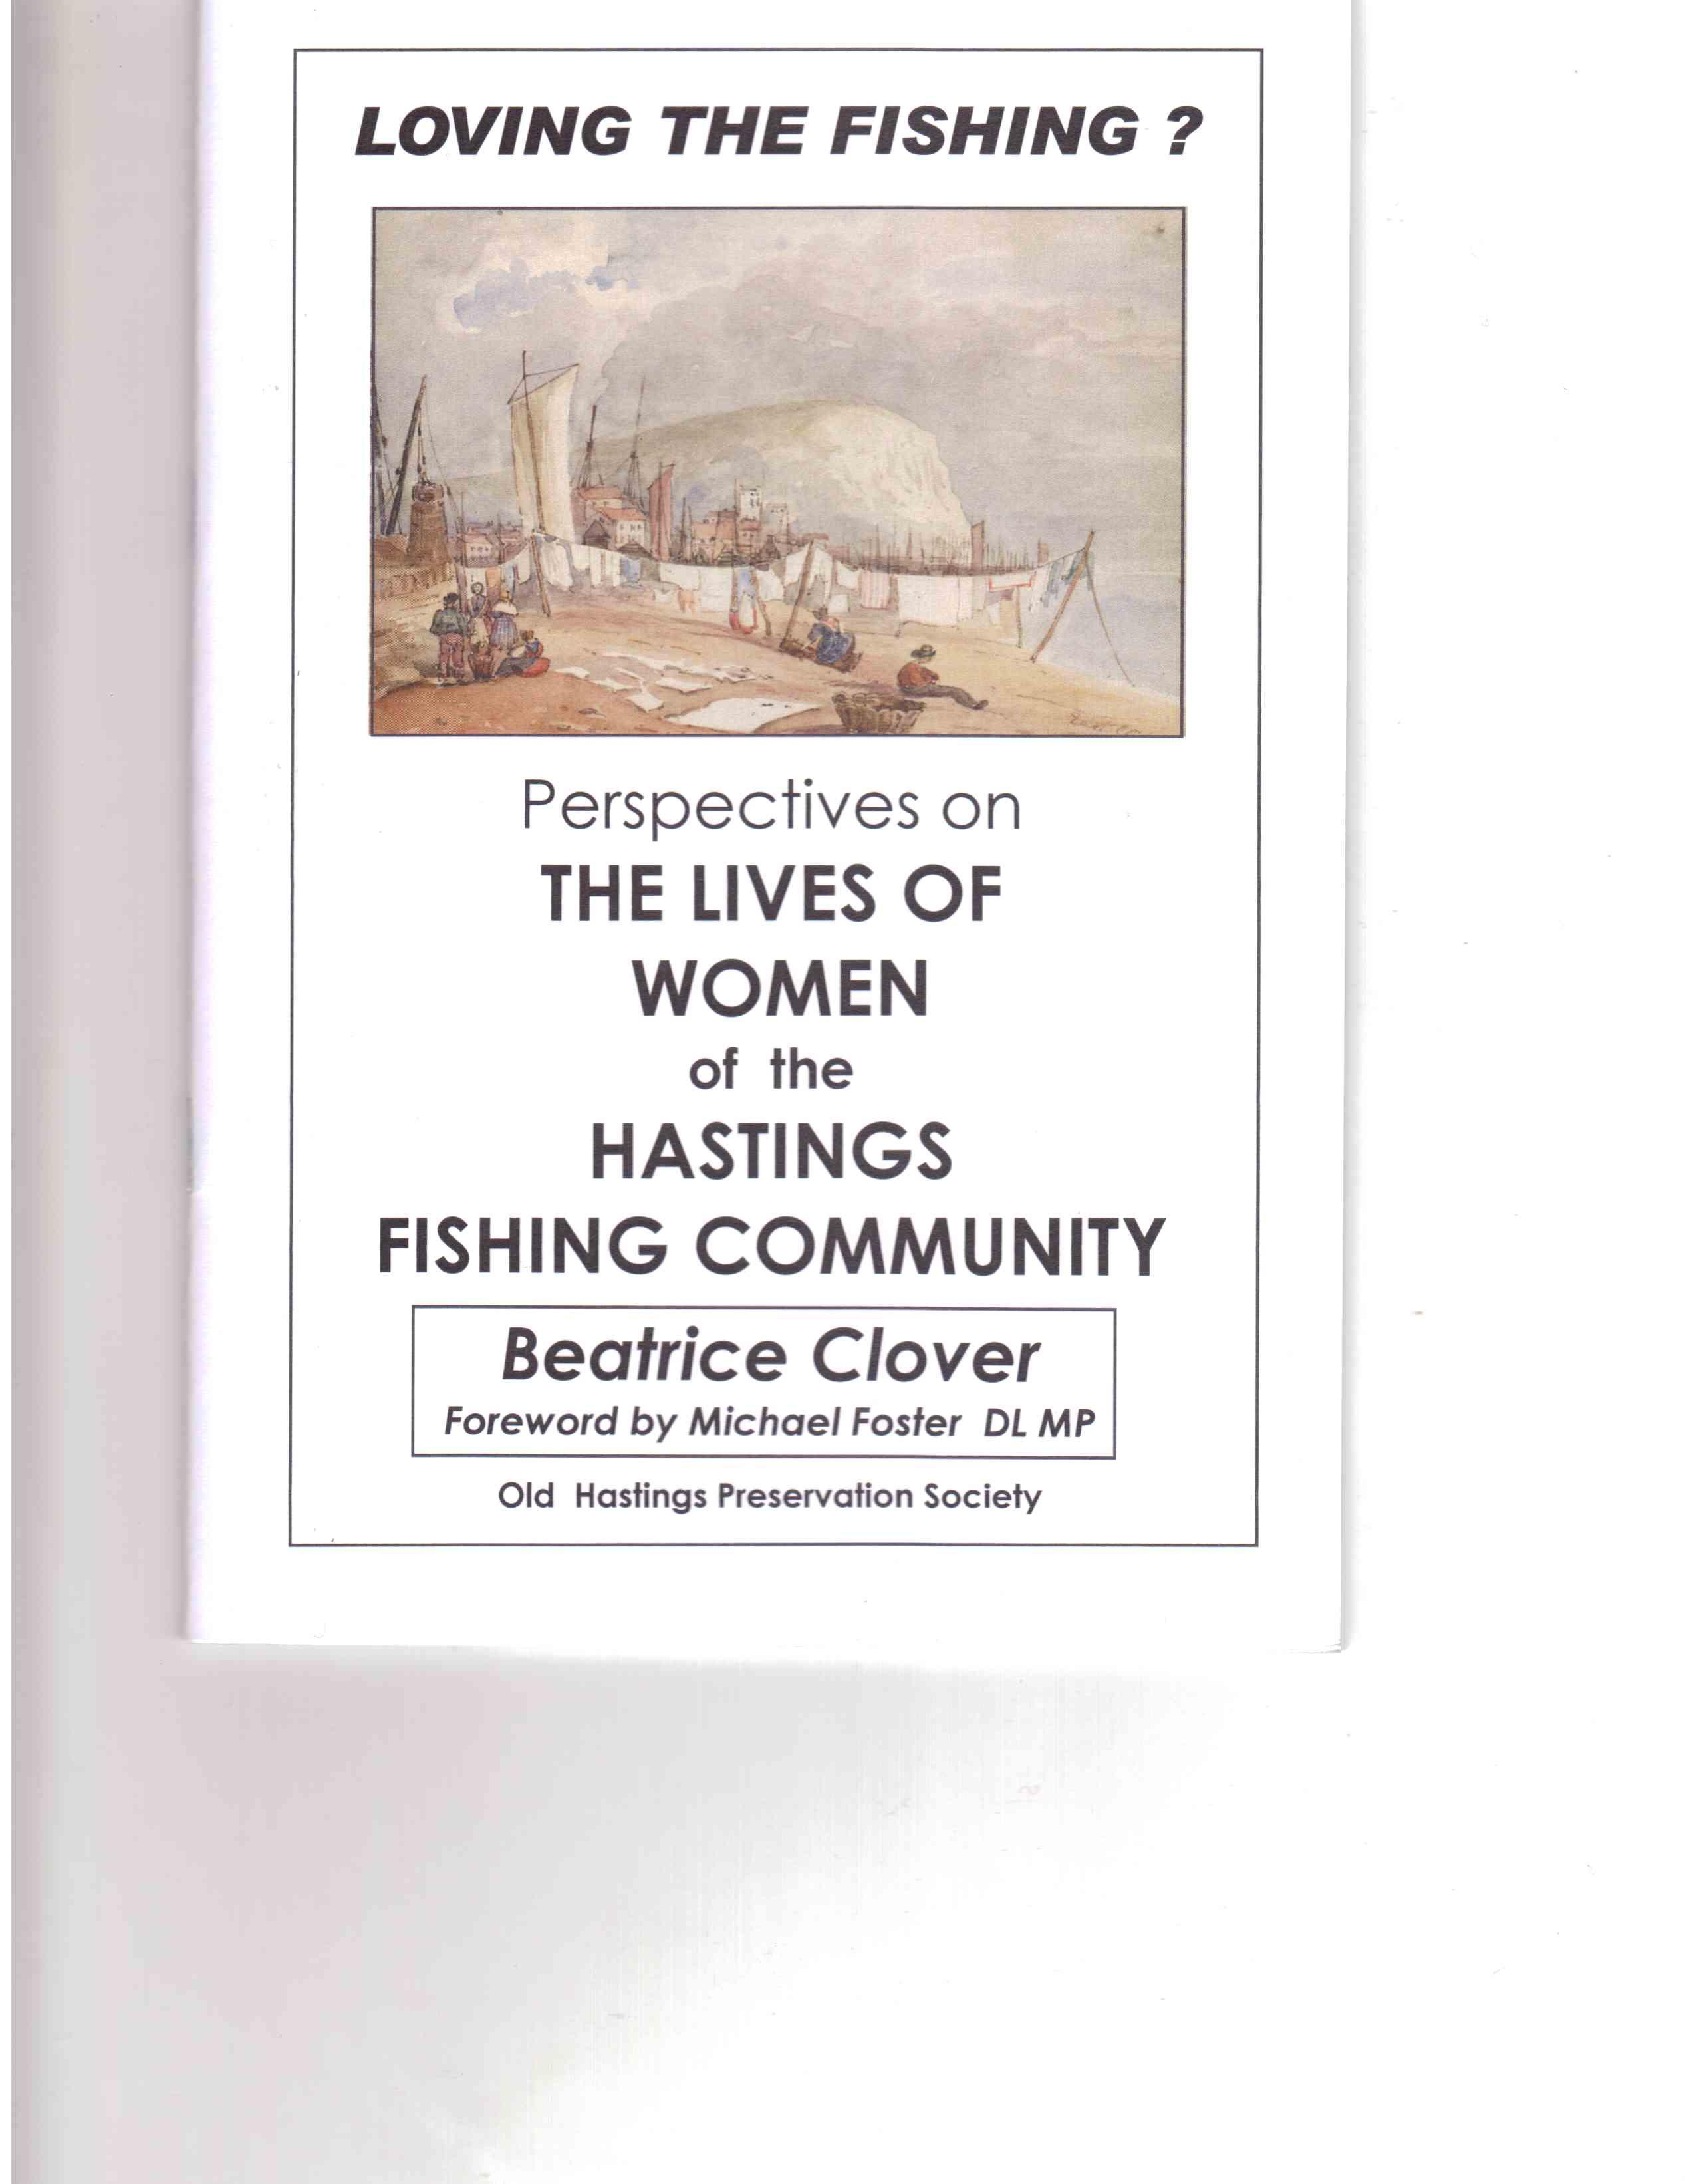 loving the fishing